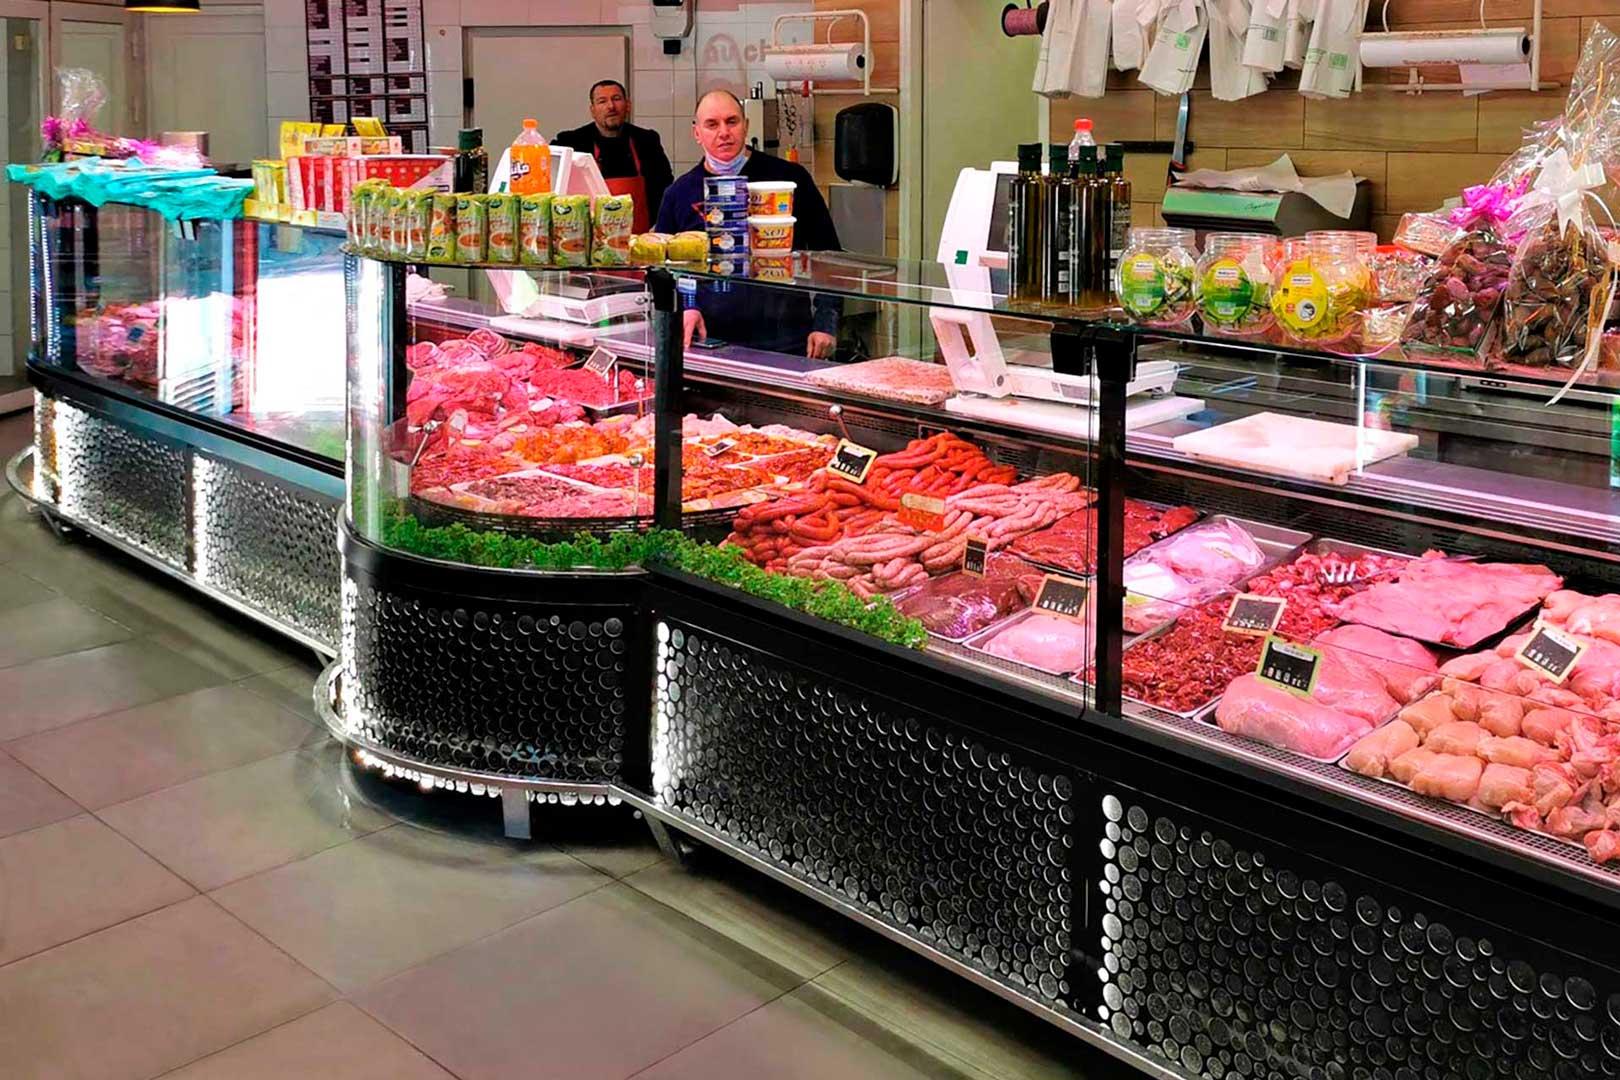 Refrigerated counters Missouri MC 120 M, minimarket L'AVENIR in France